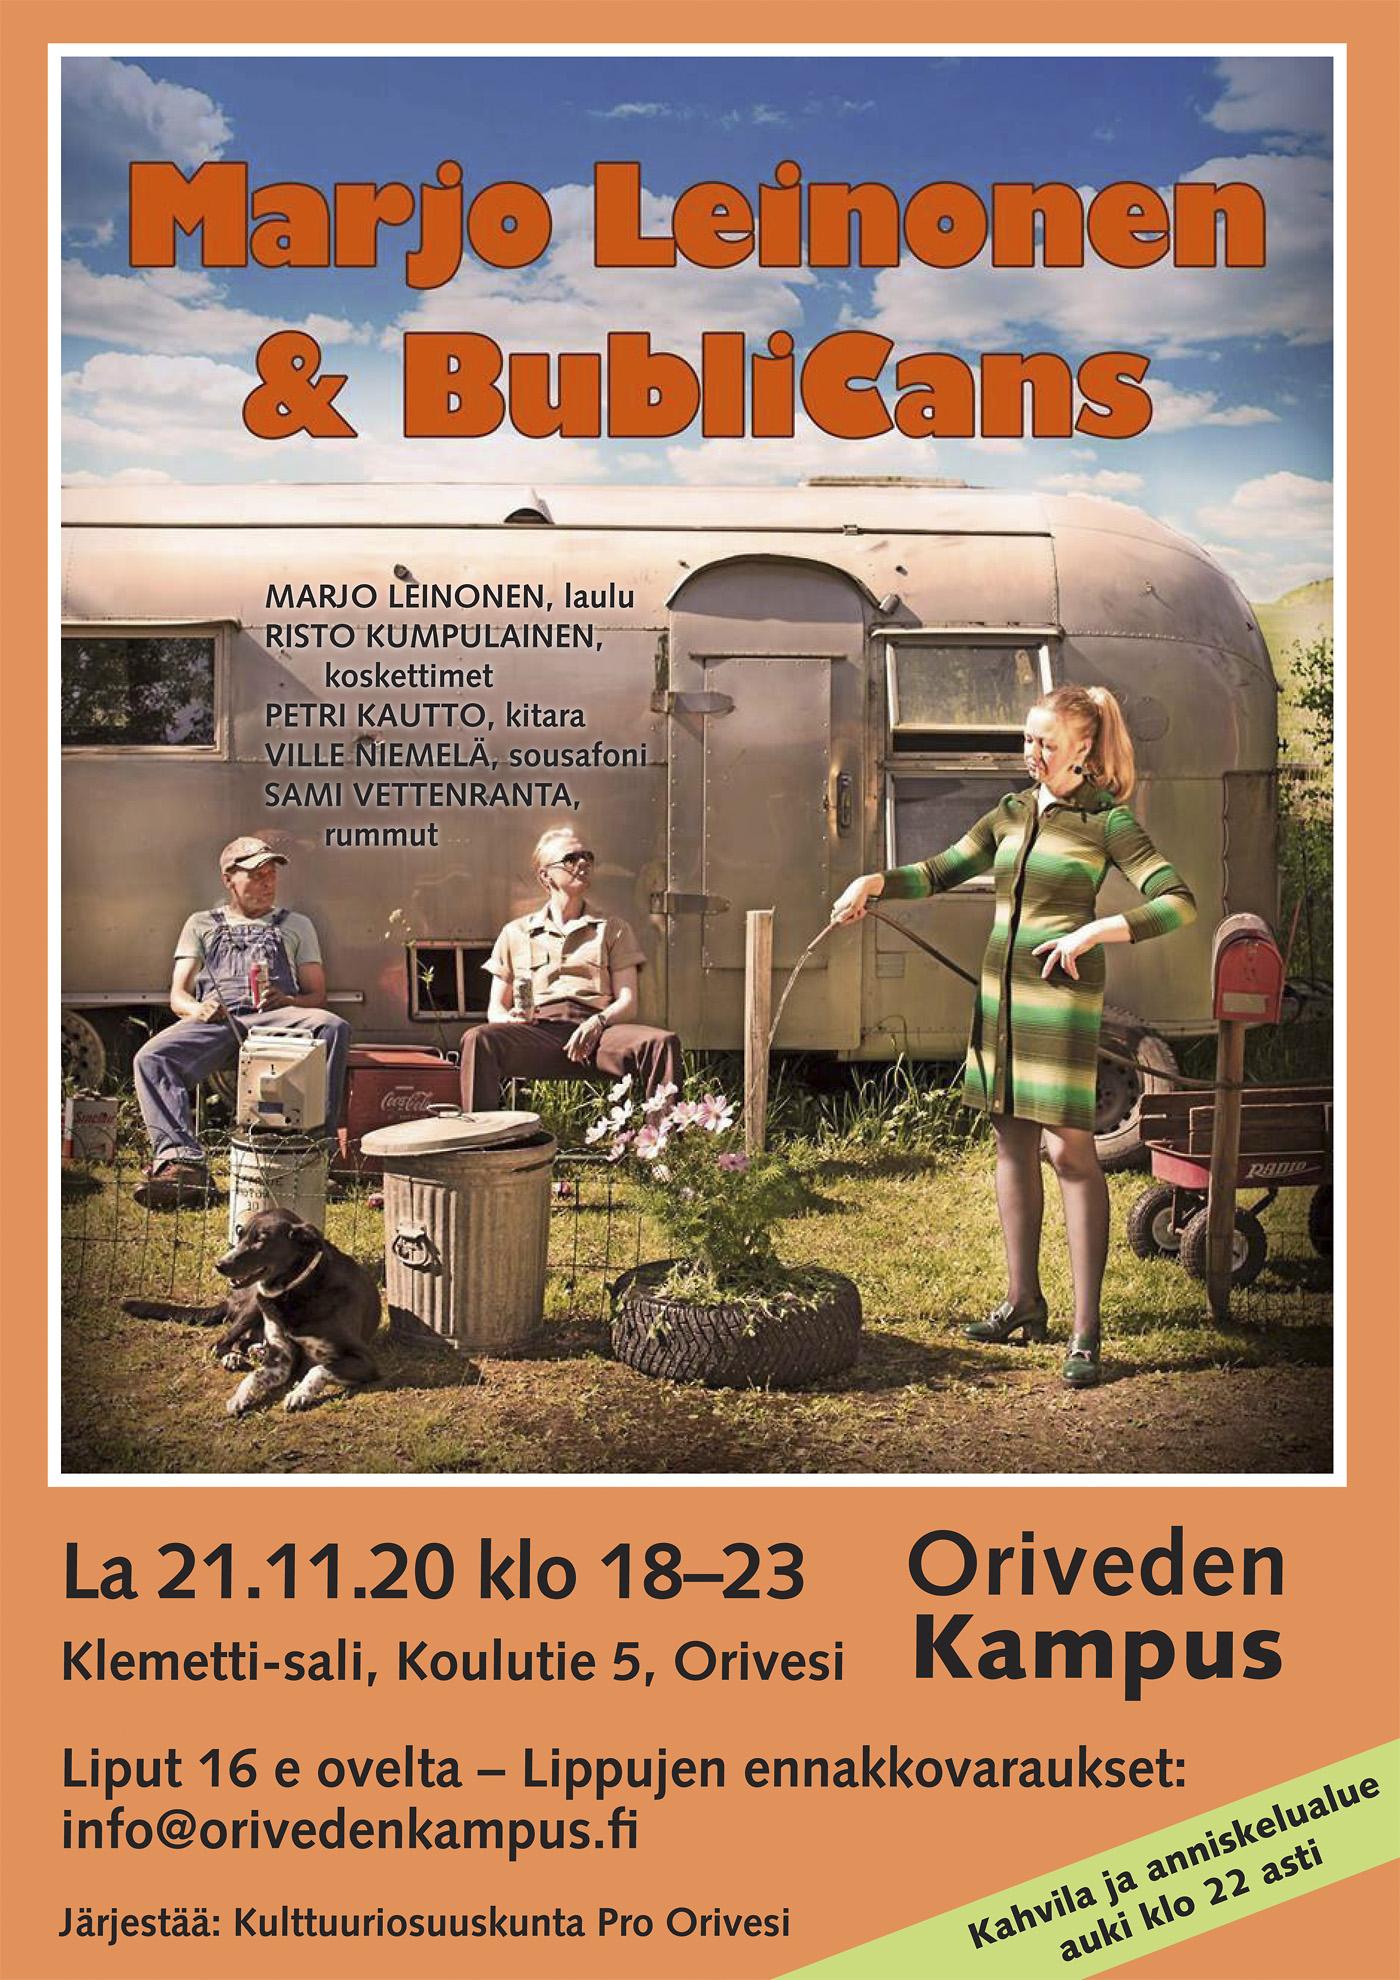 Marjo Leinonen & BubliCans konsertti Oriveden Kampuksella